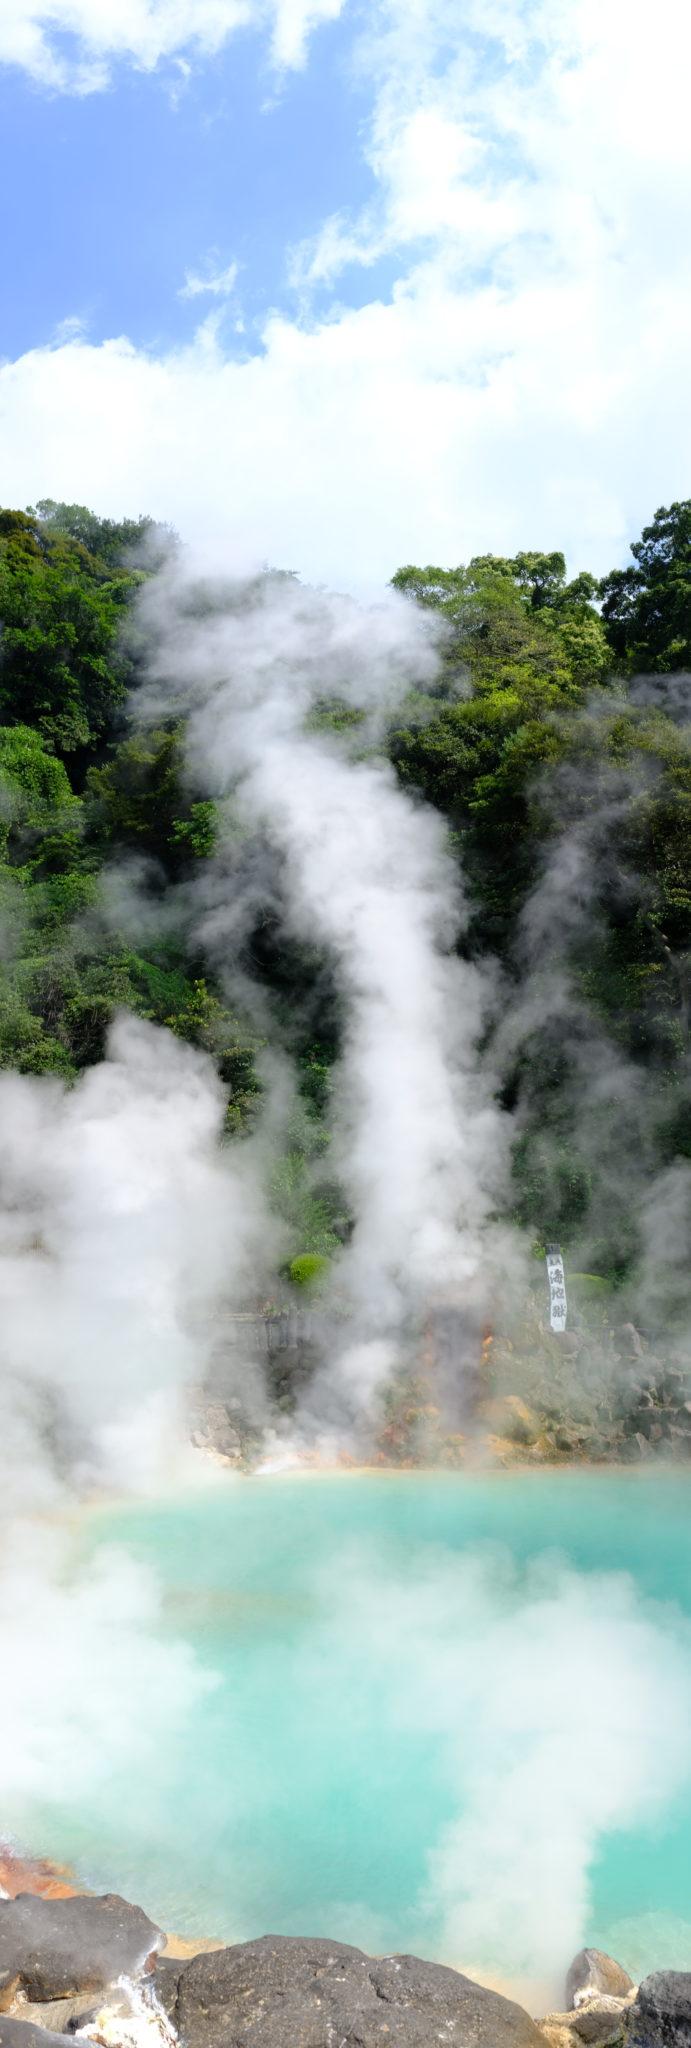 Über 100 Grad heißer Dampf